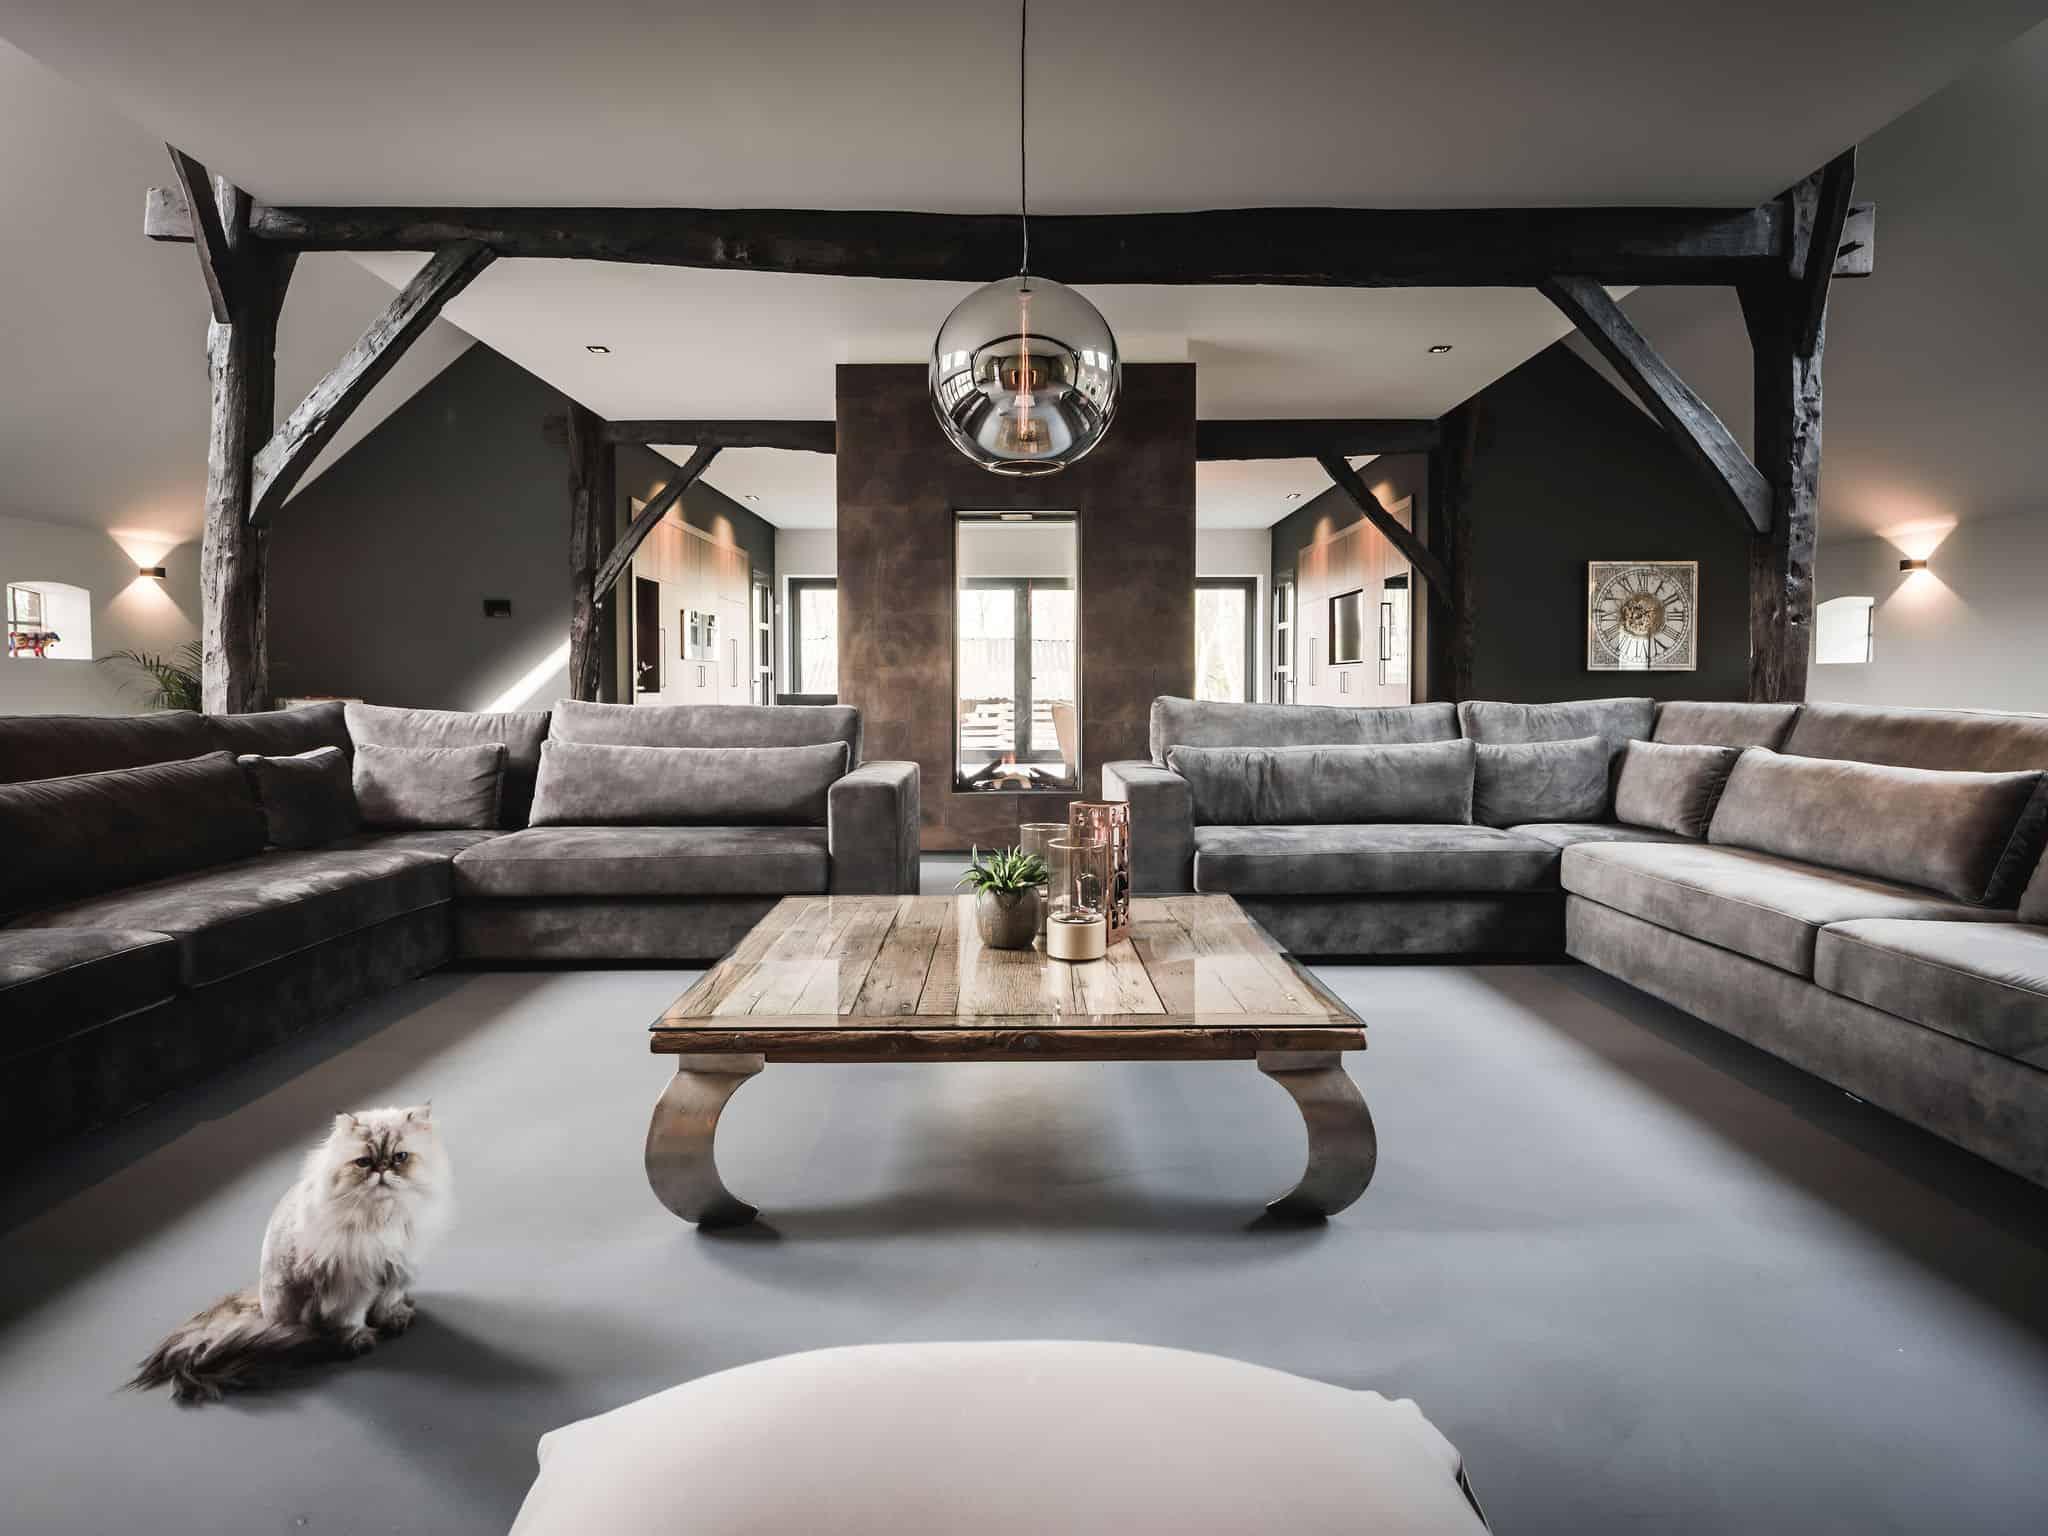 interieurarchitect Wildenberg ontwerp interieur woonboerderij Velux Eve Bulbs hanglampen Kreon wandlampen Kusk haarden beton gietvloer